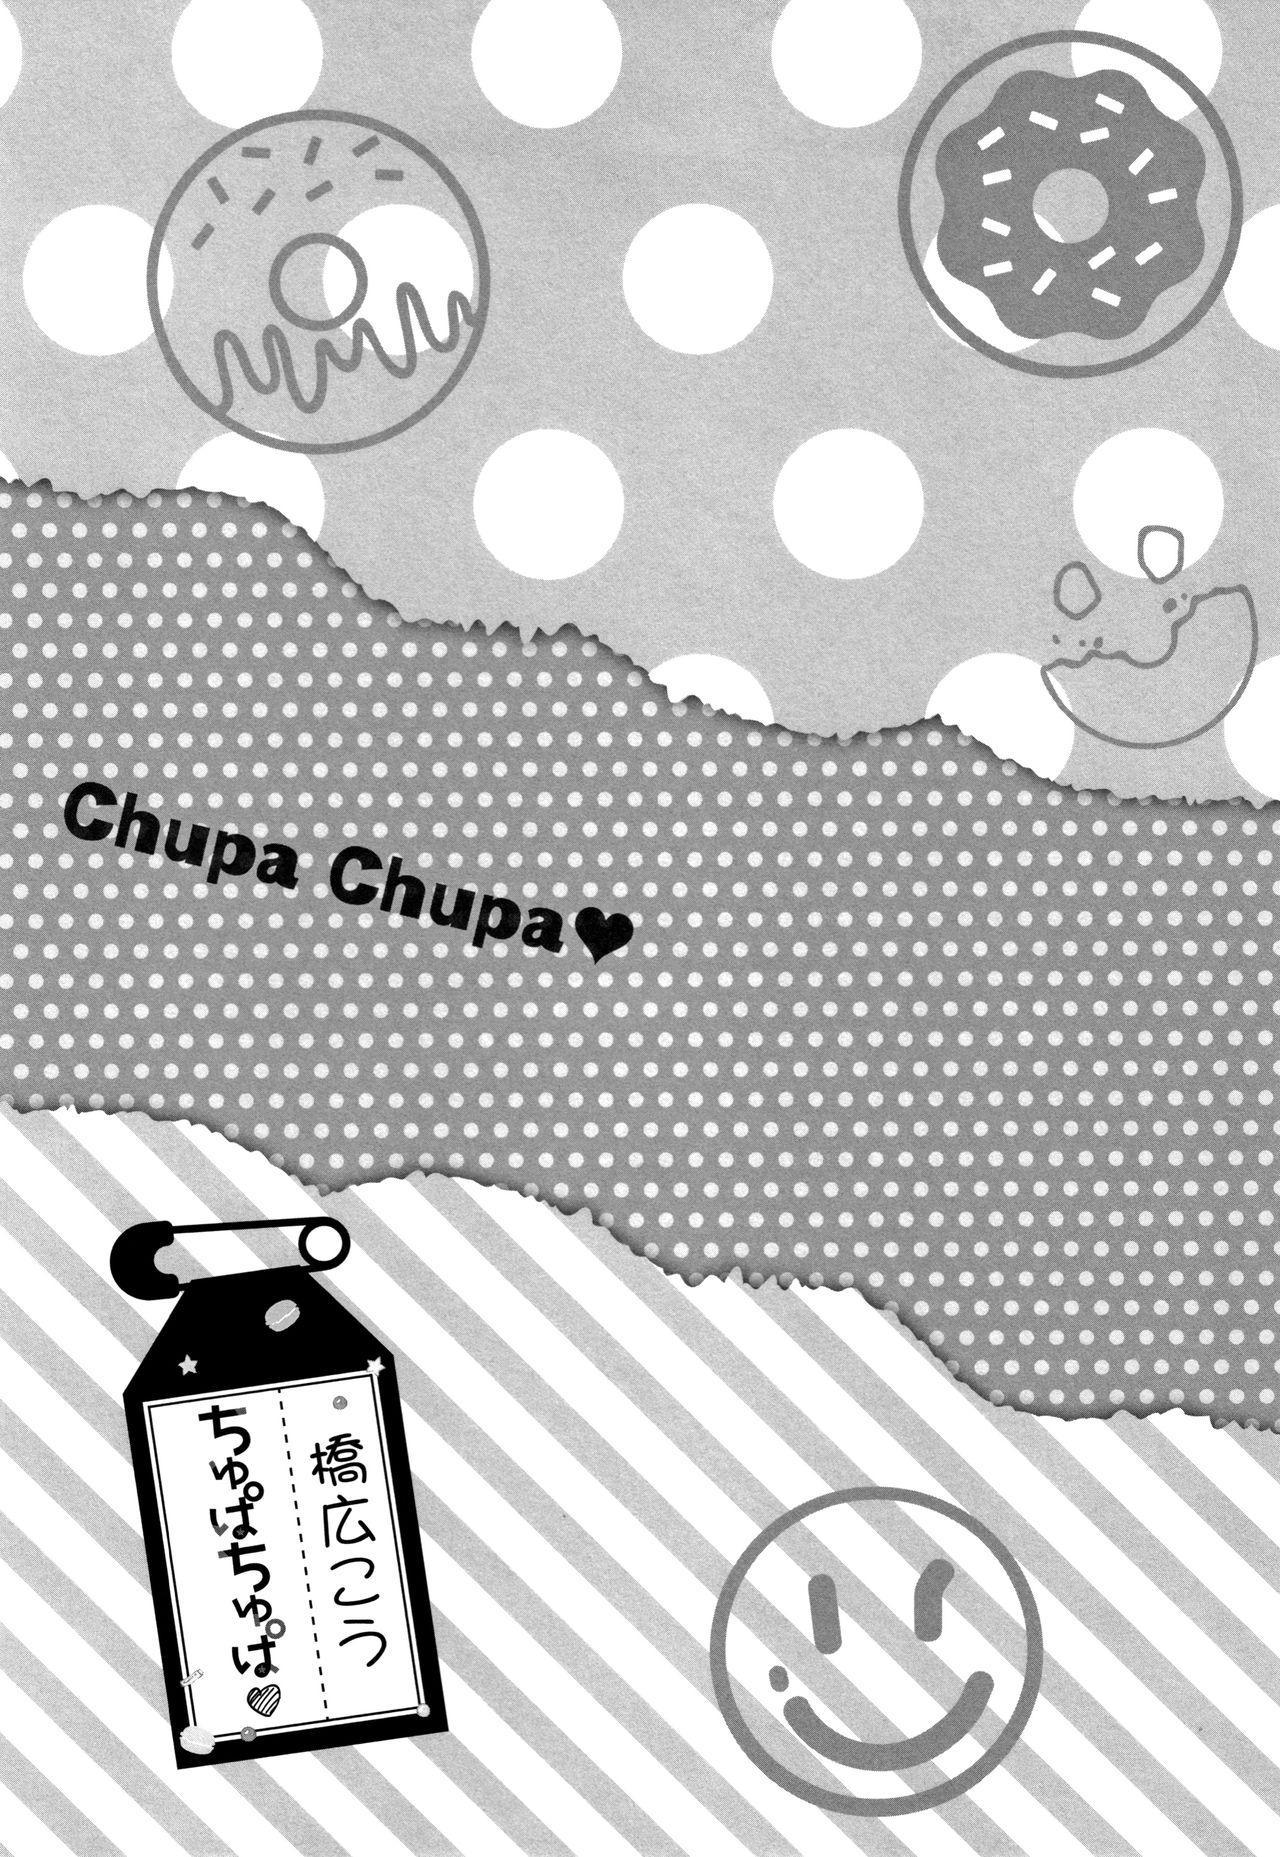 Chupa Chupa 127